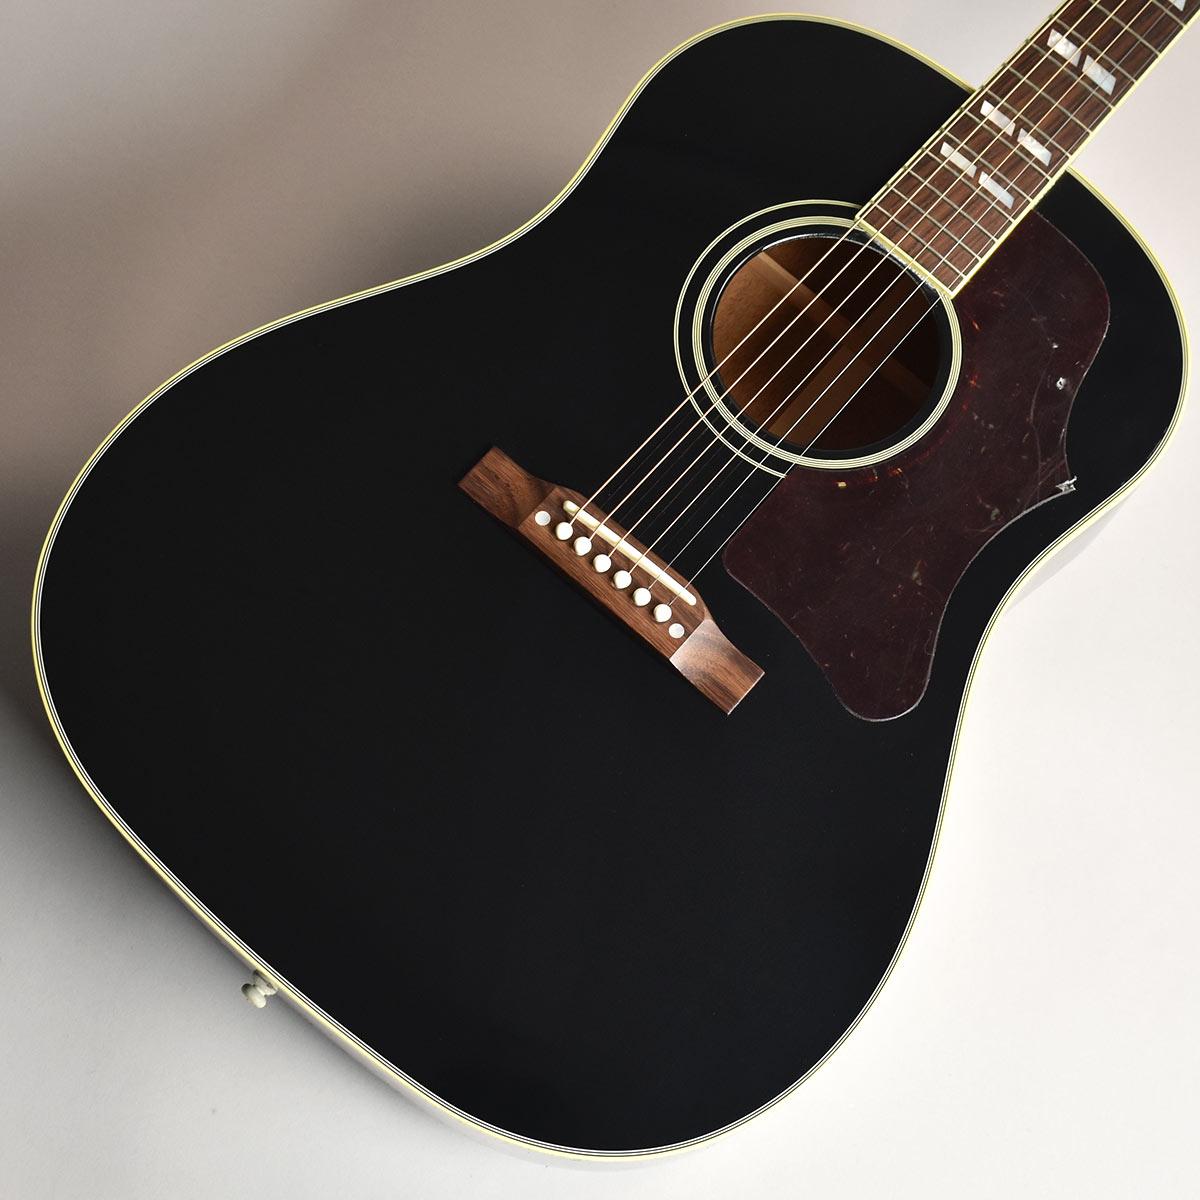 Gibson Southern Jumbo Ebony S/N:10577027 【数量限定 ギグバッグ付属】 【ギブソン】【未展示品】【アウトレット】